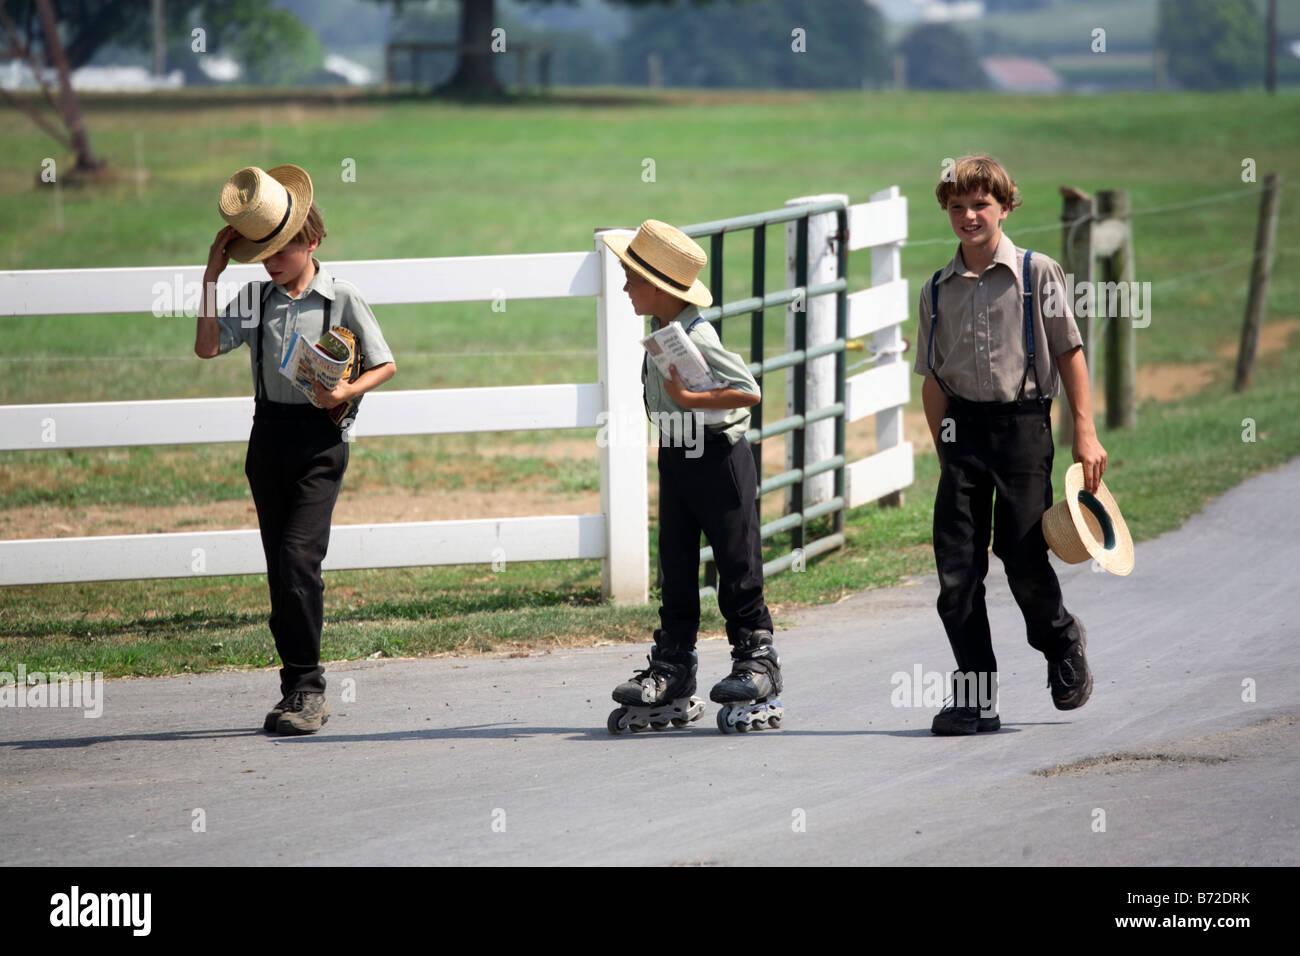 Roller skating lancaster pa - Amish Boys In Lancaster Pennsylvania Wearing Roller Blades